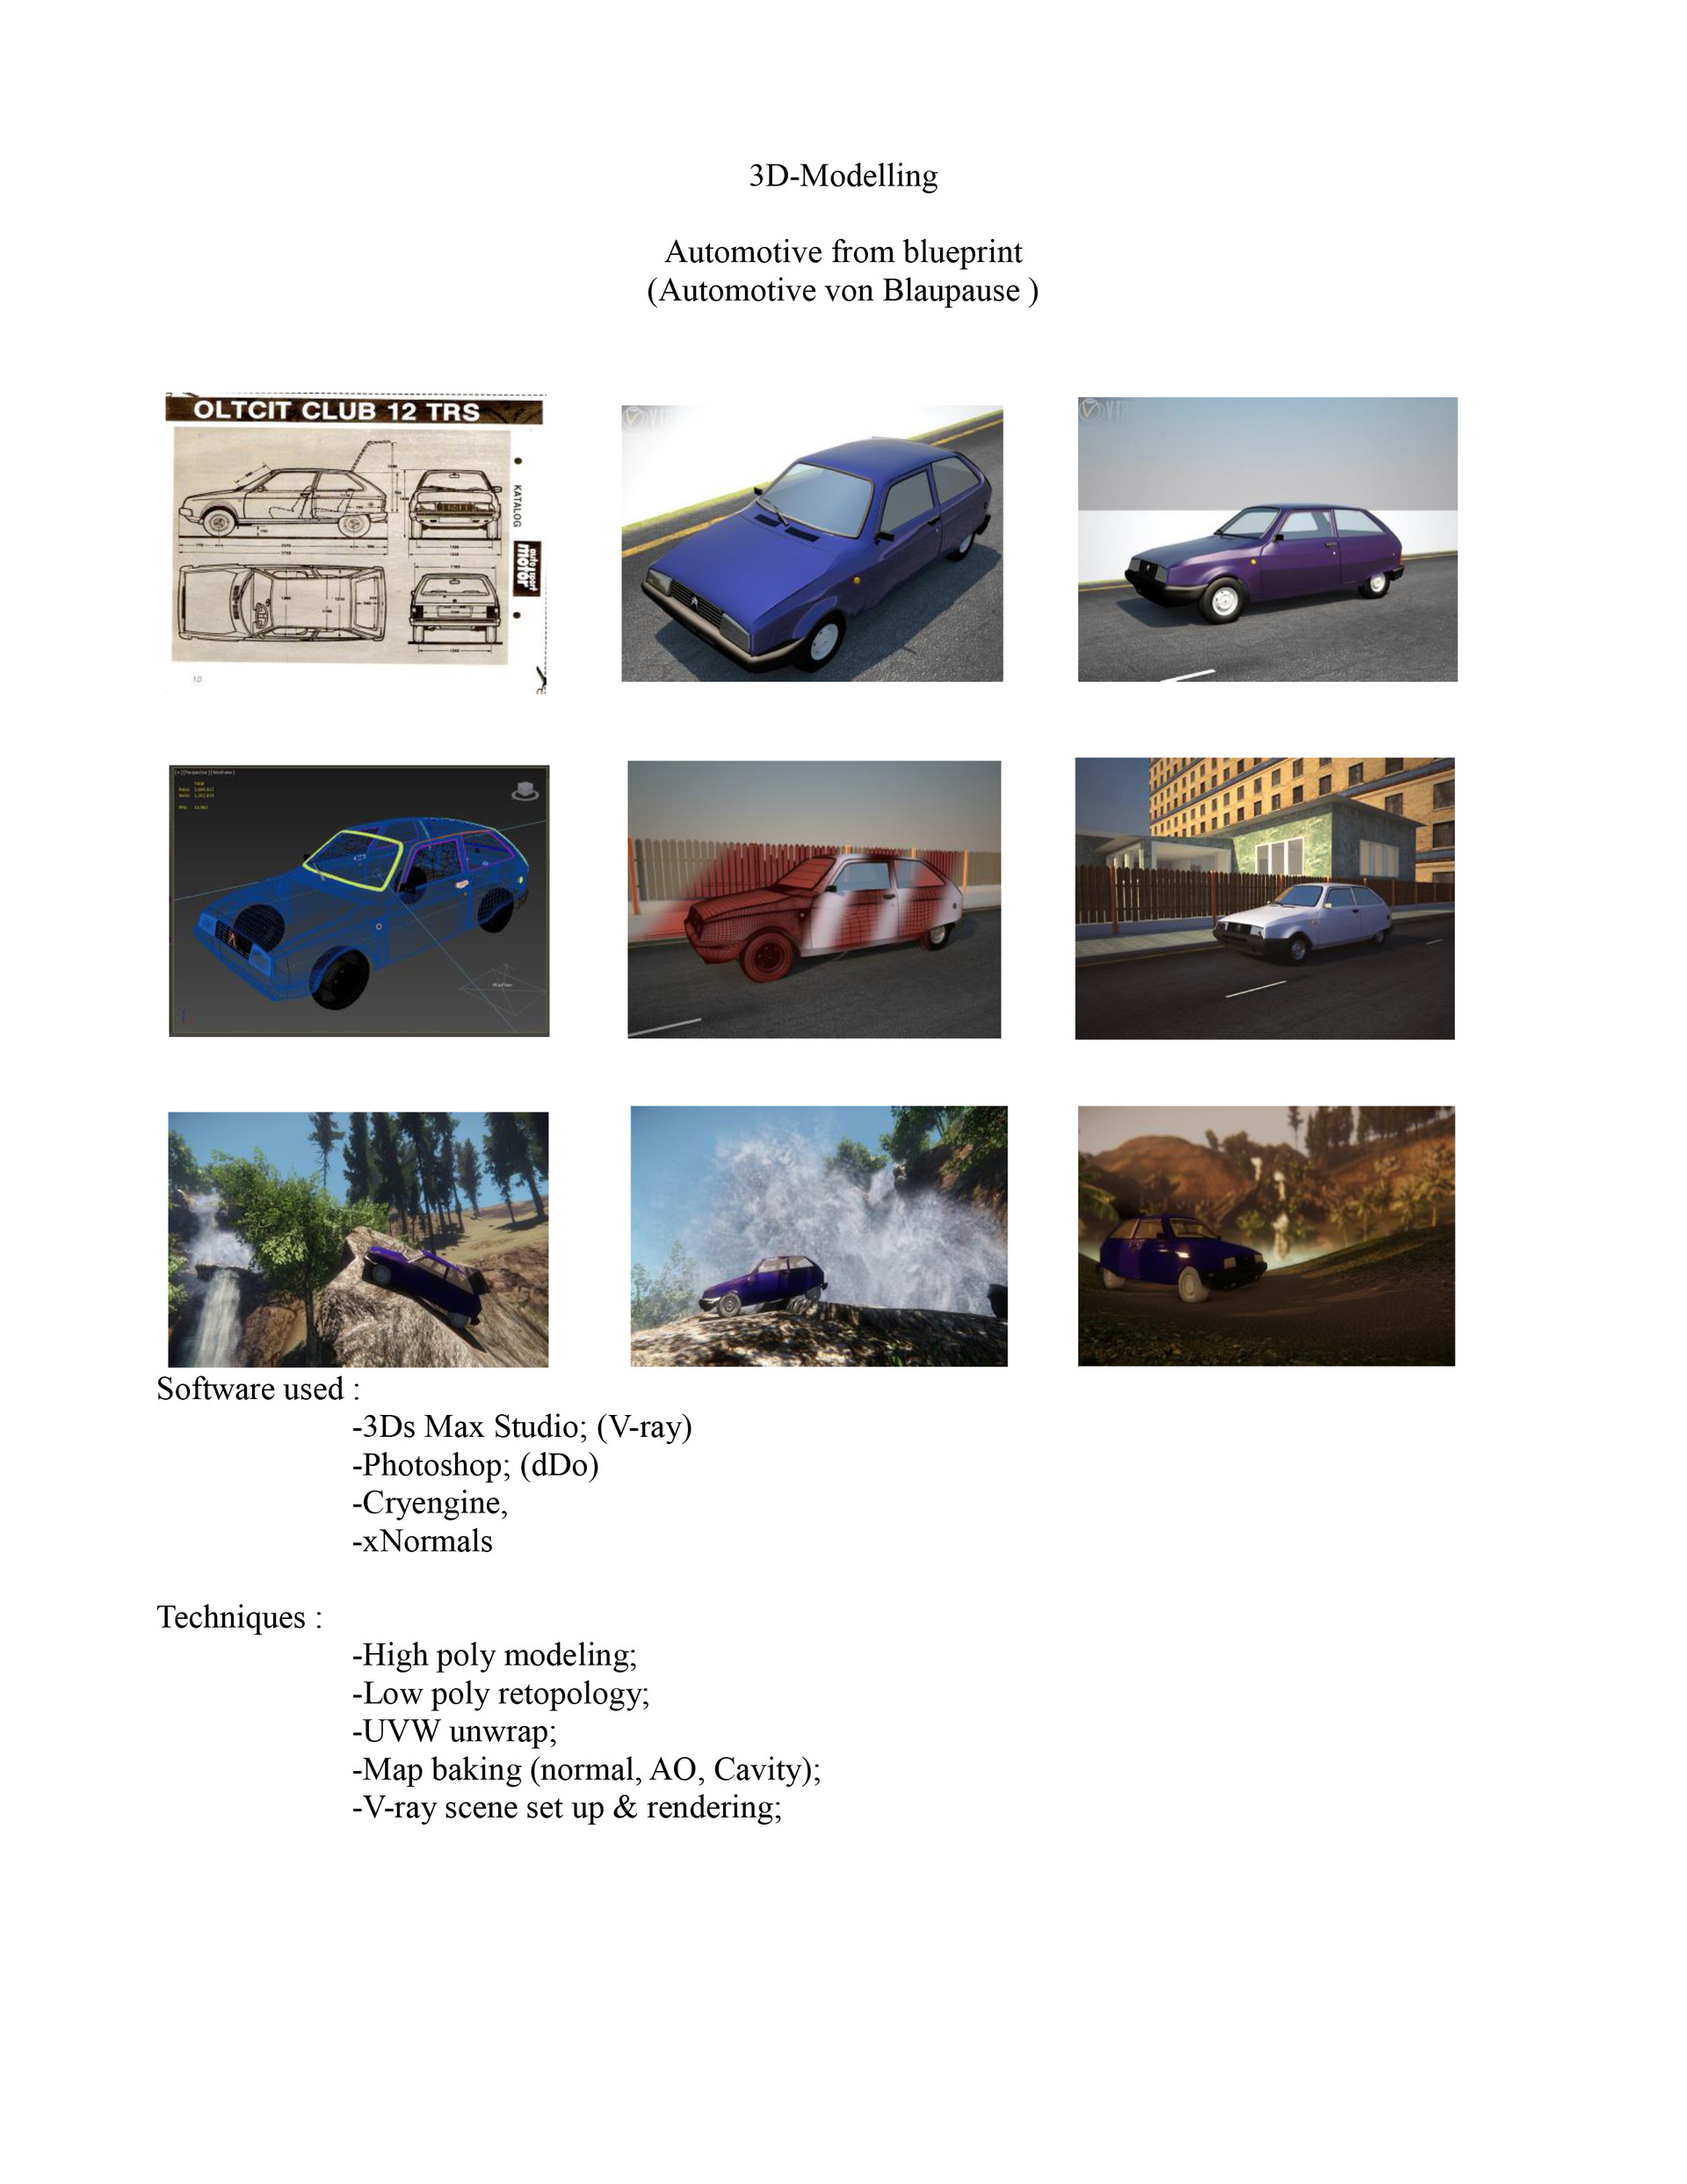 Großzügig Rennwagen Blaupausen Ideen - Schaltplan Serie Circuit ...